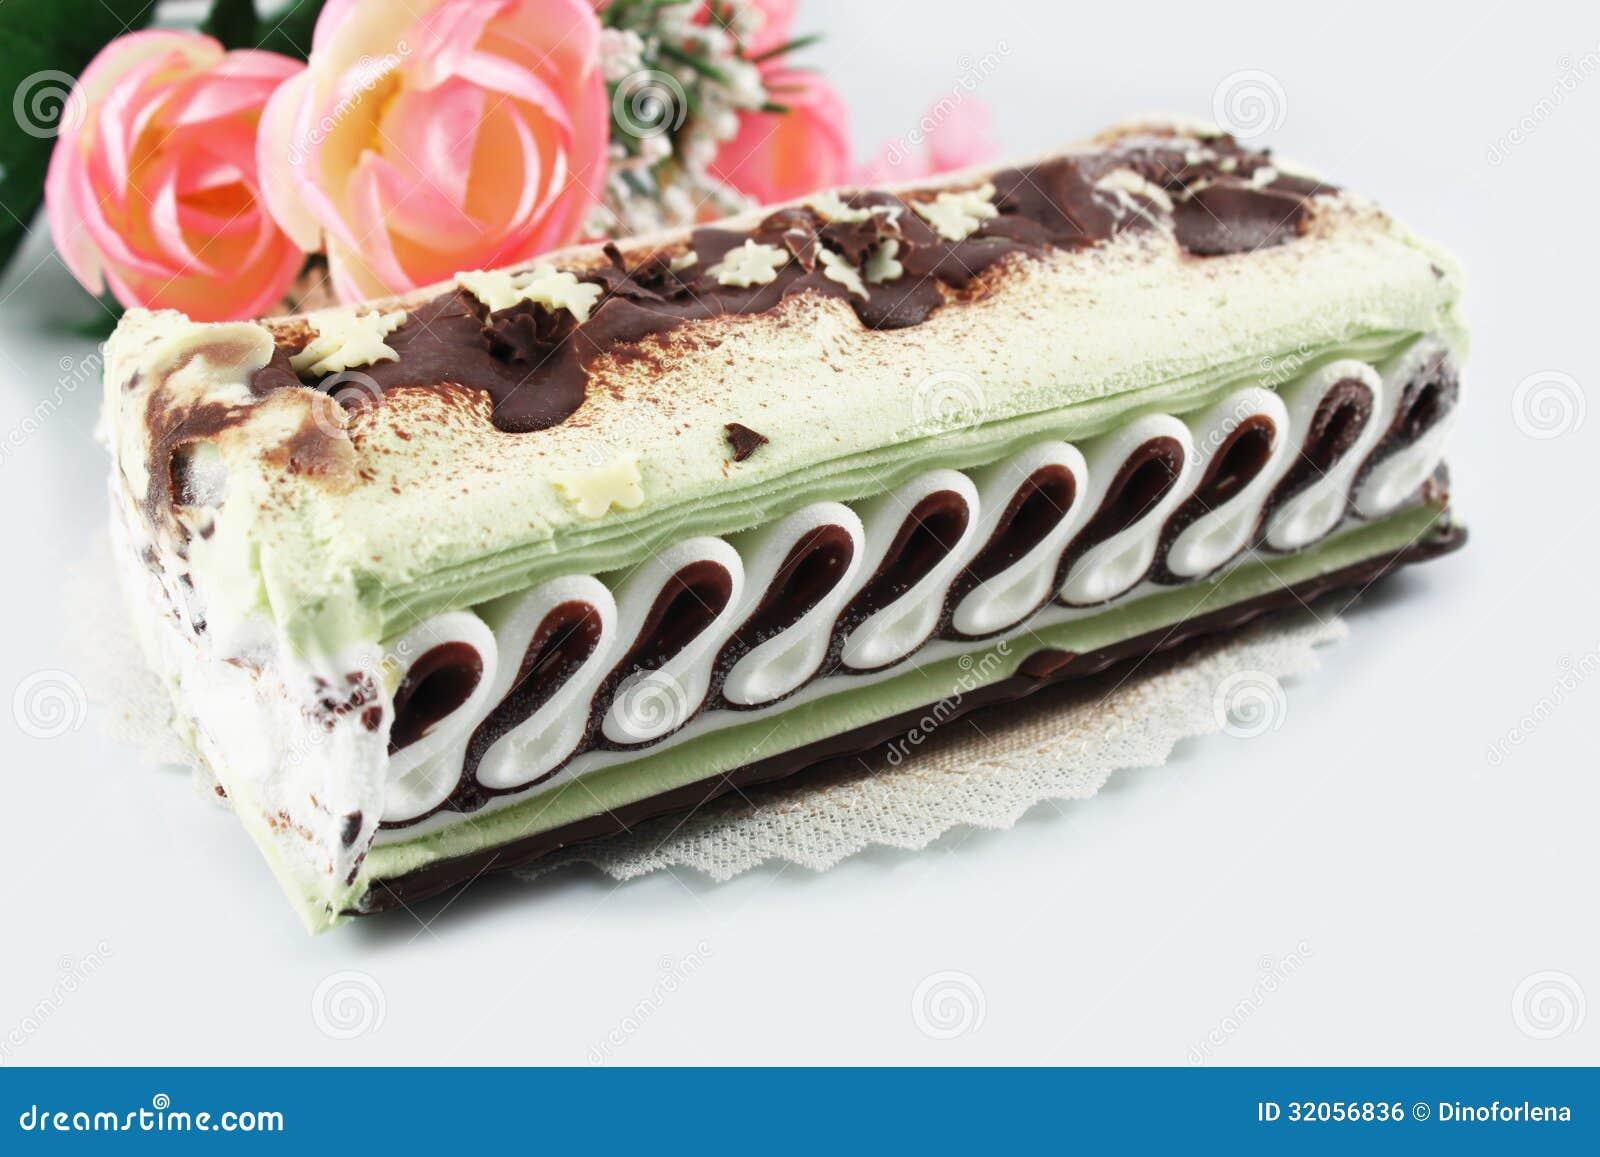 rose ice cream venice - photo#17